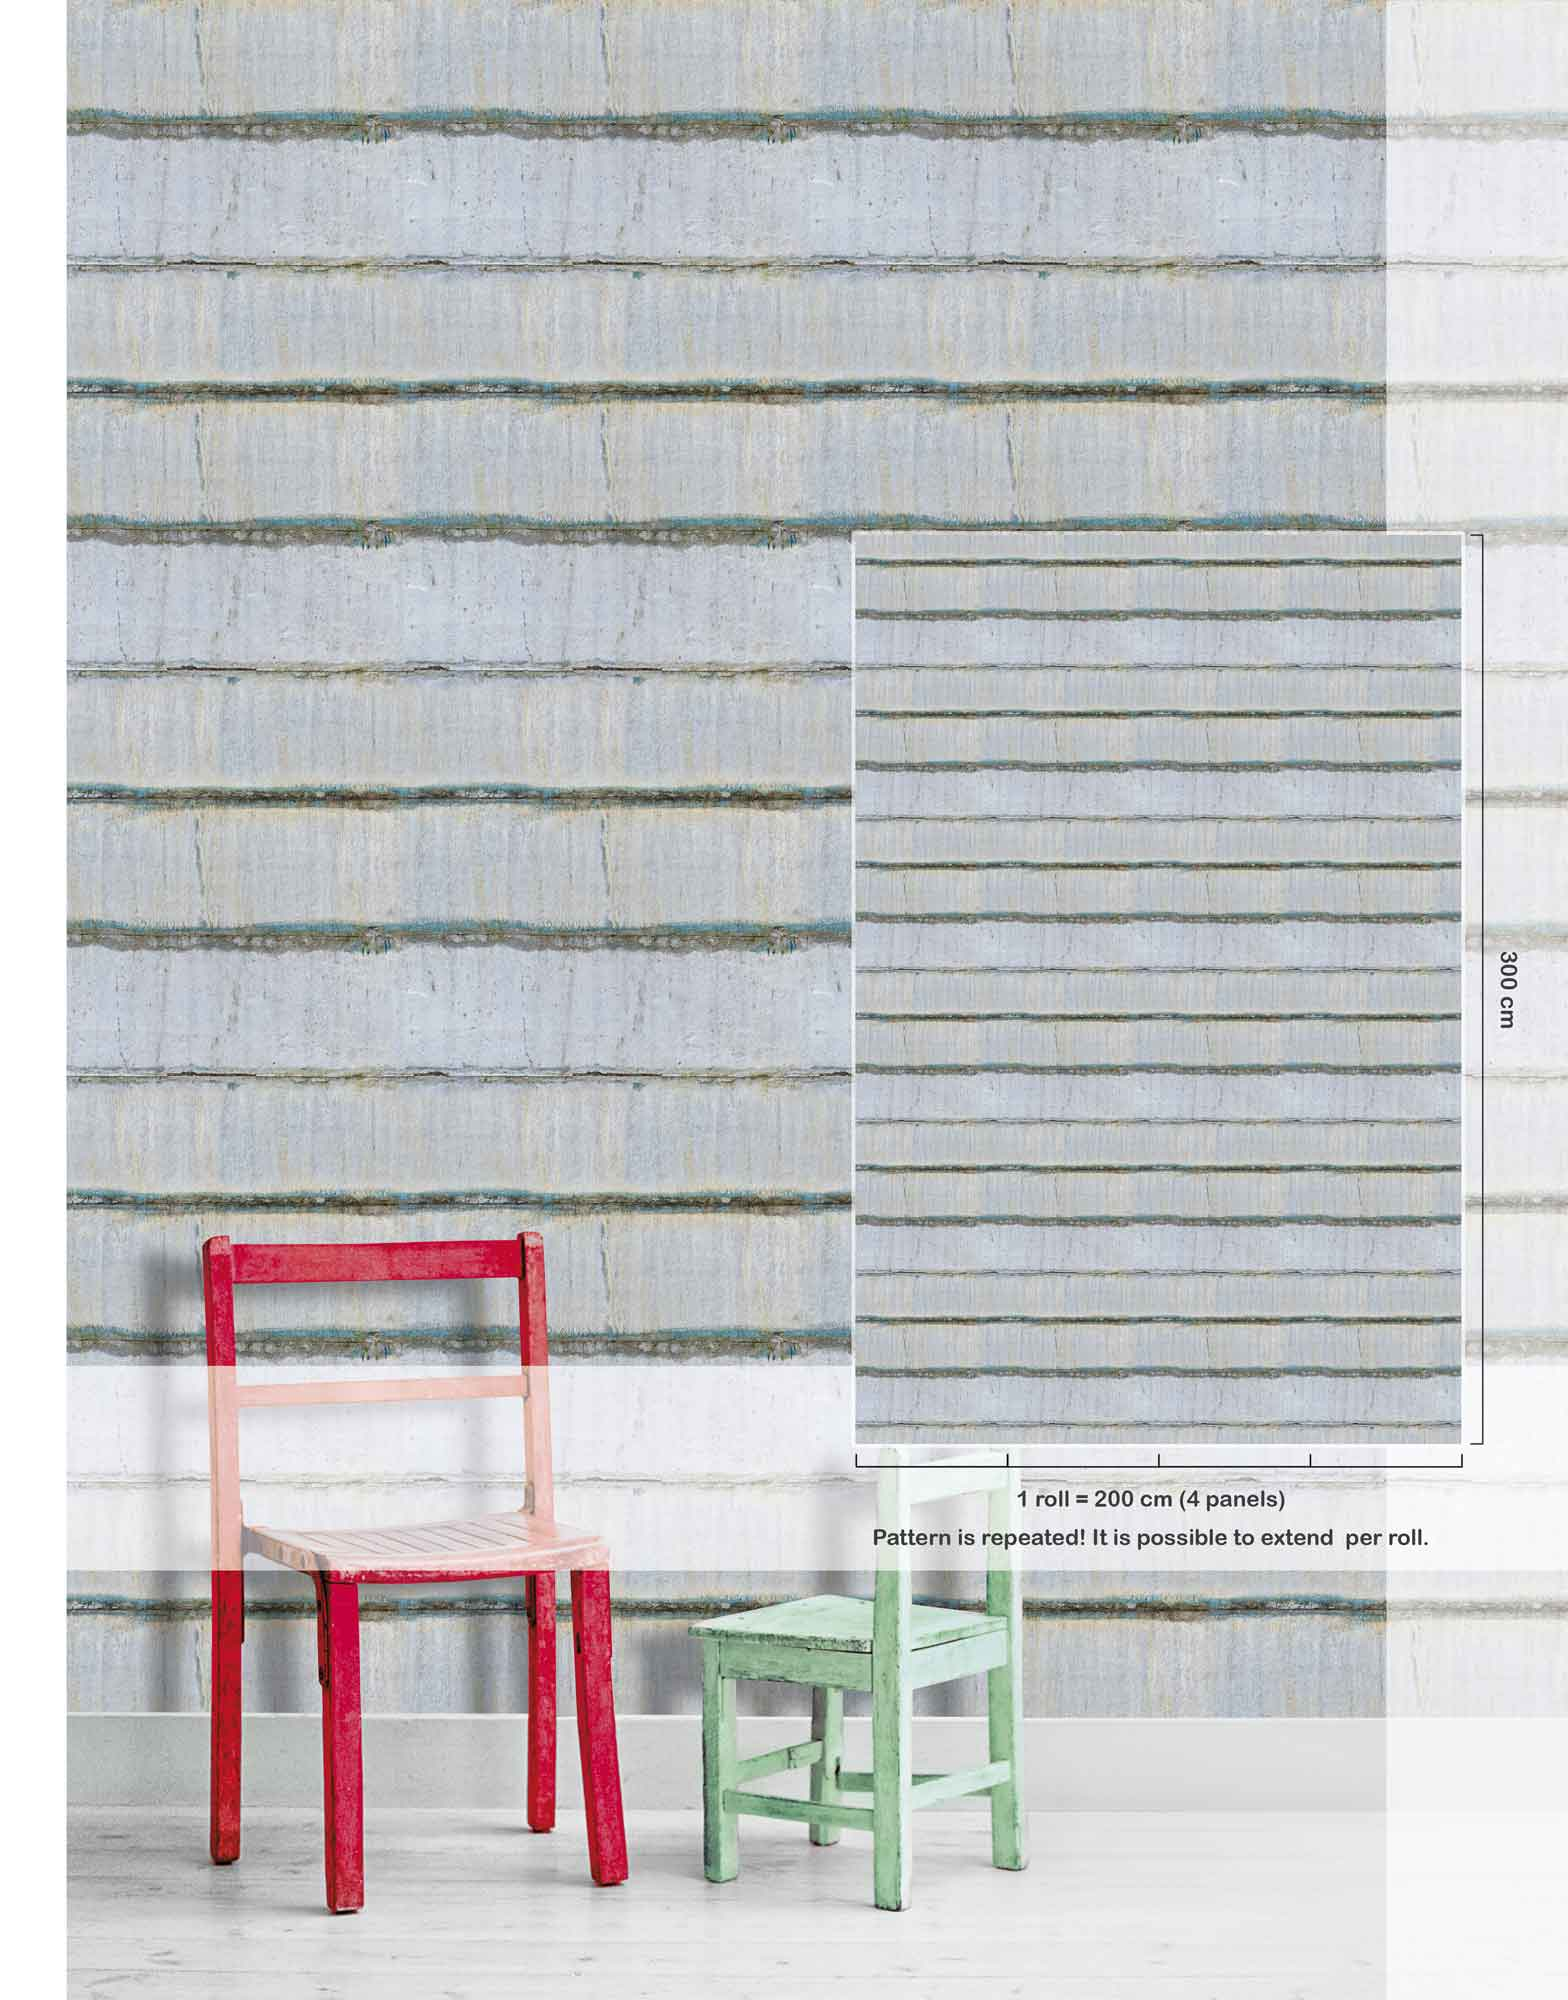 fototapeten kaufen excellent wandbild x cm poster teilig. Black Bedroom Furniture Sets. Home Design Ideas